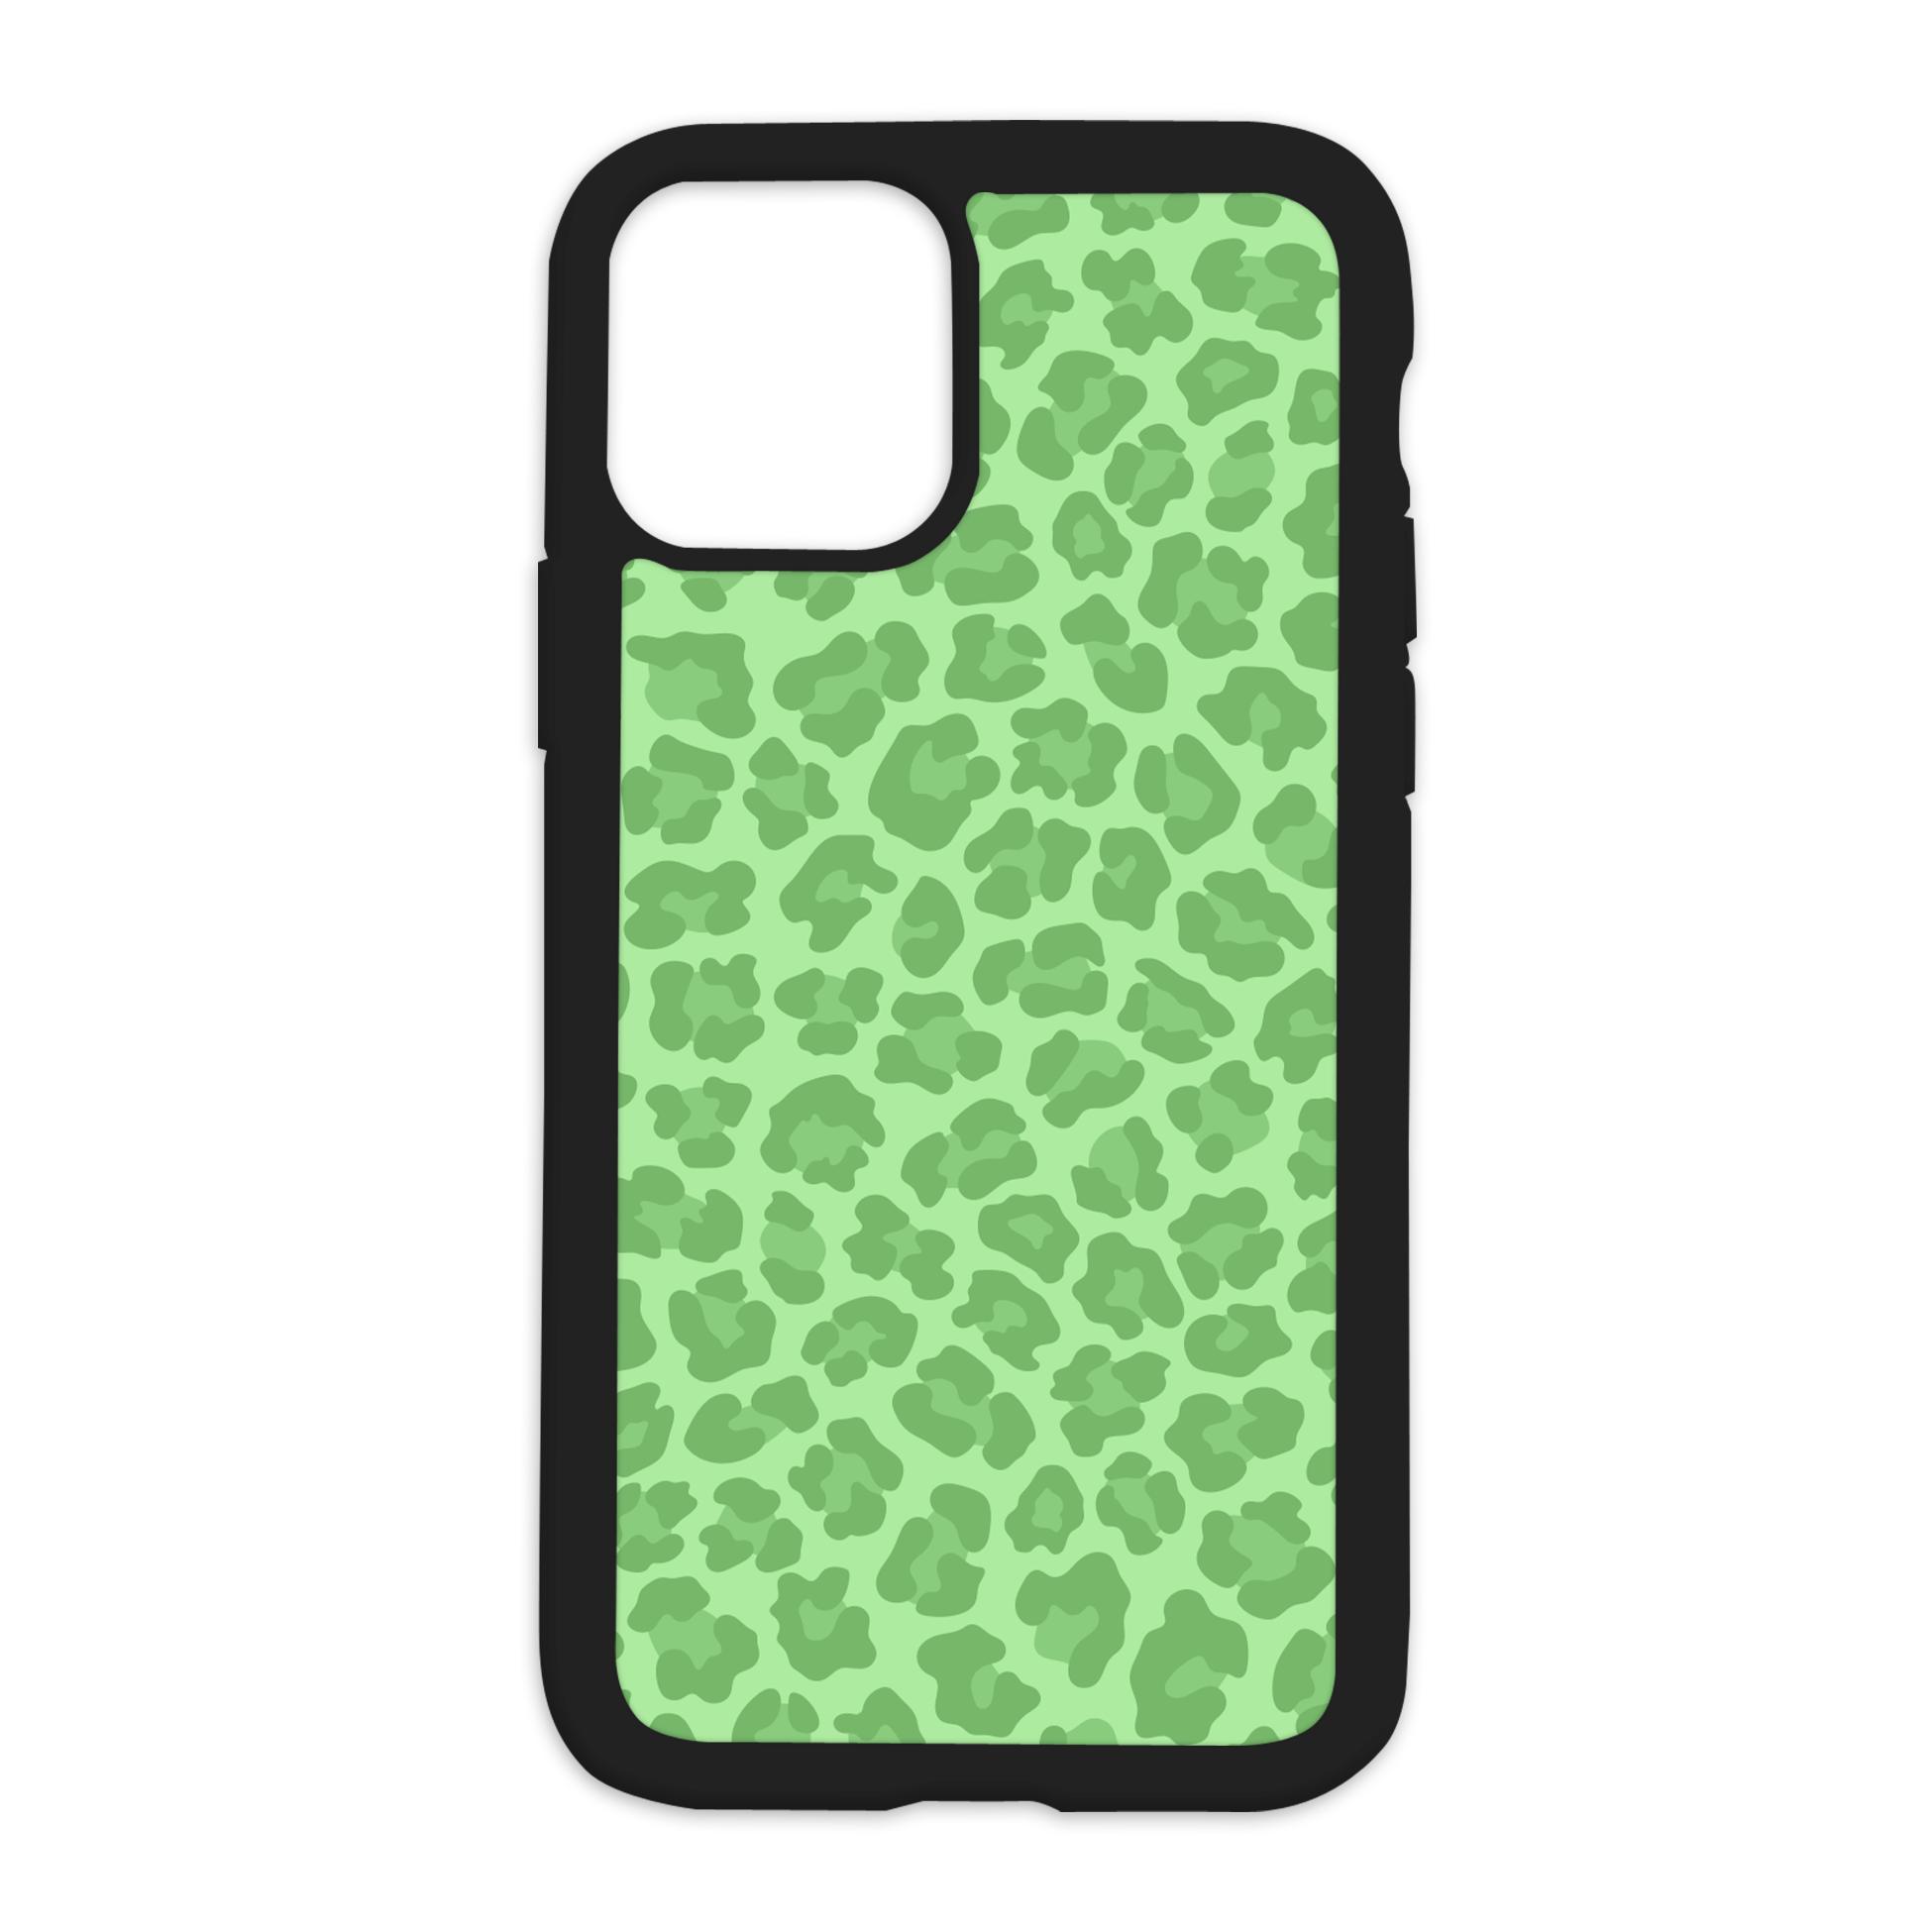 Leopard Print Design On Black Phone Case - XS MAX / Green